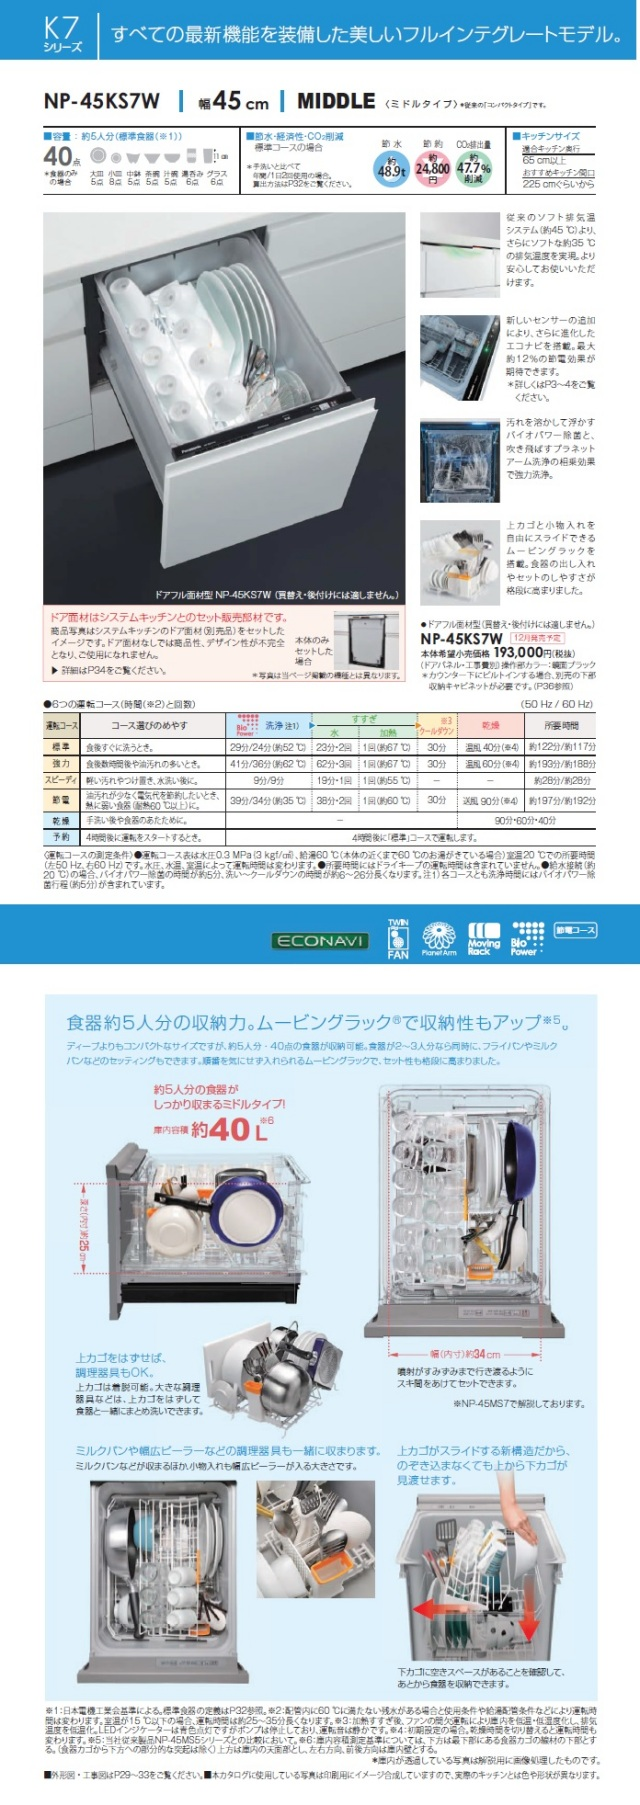 Panasonic ビルトイン食器洗い乾燥機 KS7W 商品説明